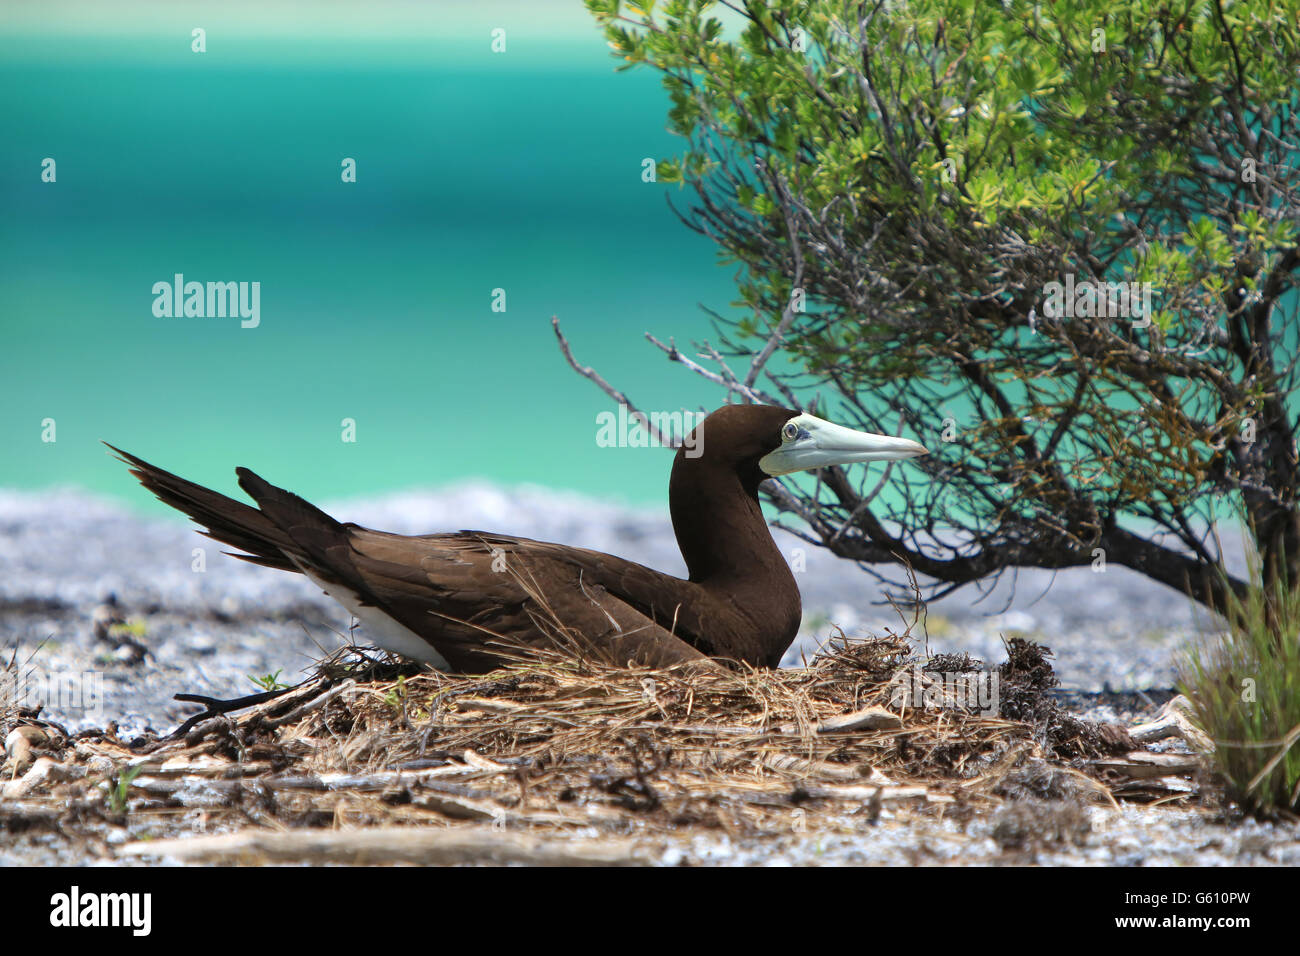 Nesting Brown Booby bird, Christmas Island, Kiribati - Stock Image